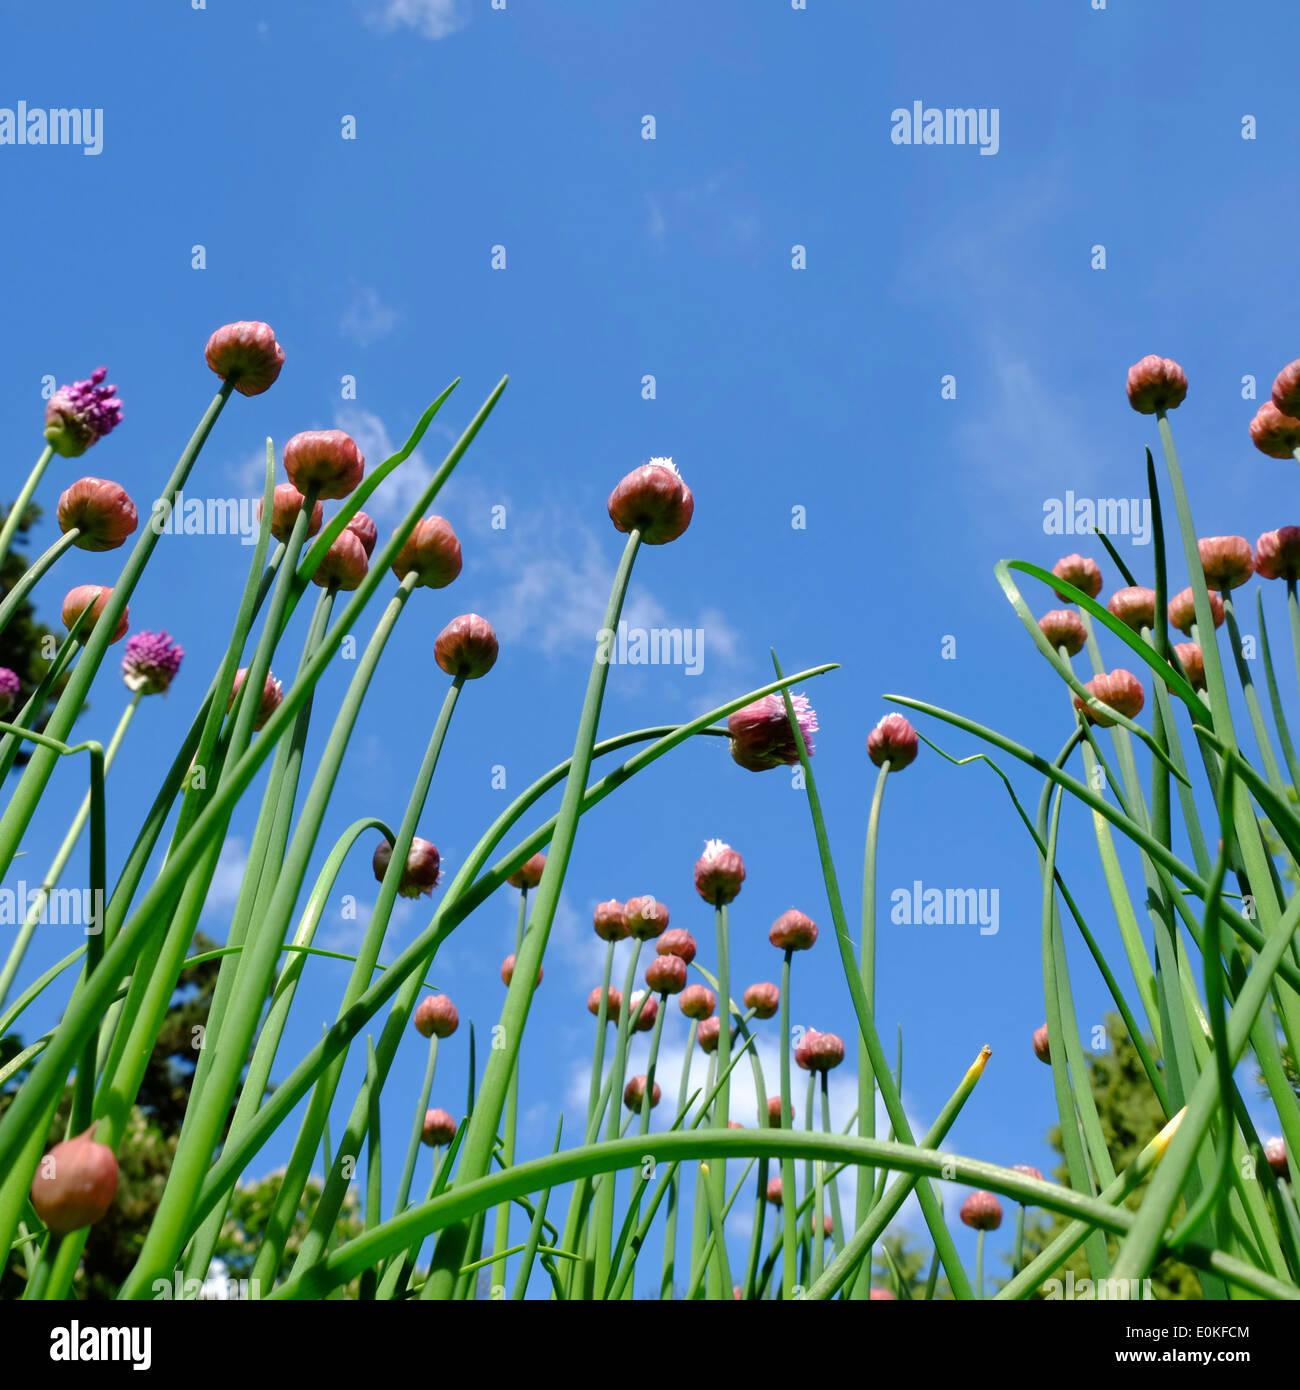 Allium flowers opening against sky - Stock Image